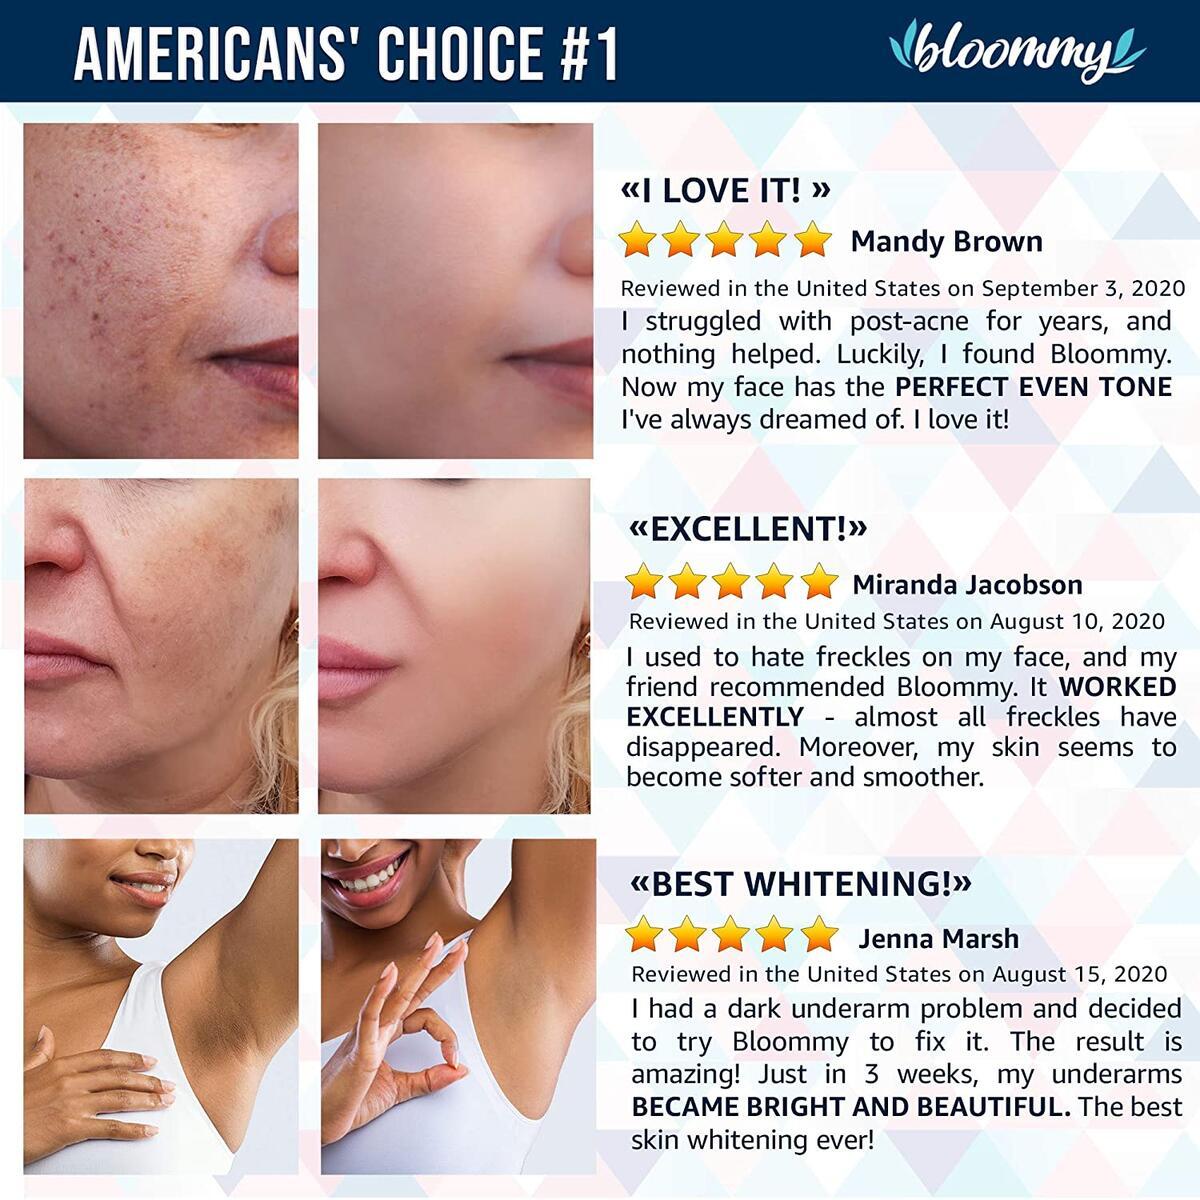 Glutathione Supplement 3000 MG - Made in USA - Natural Skin Brightening Treatment - Vegan Glutathione Capsules for Even Skin Tone - Dark Spots & Hyperpigmentation Relief - Non-GMO - 60 Pills